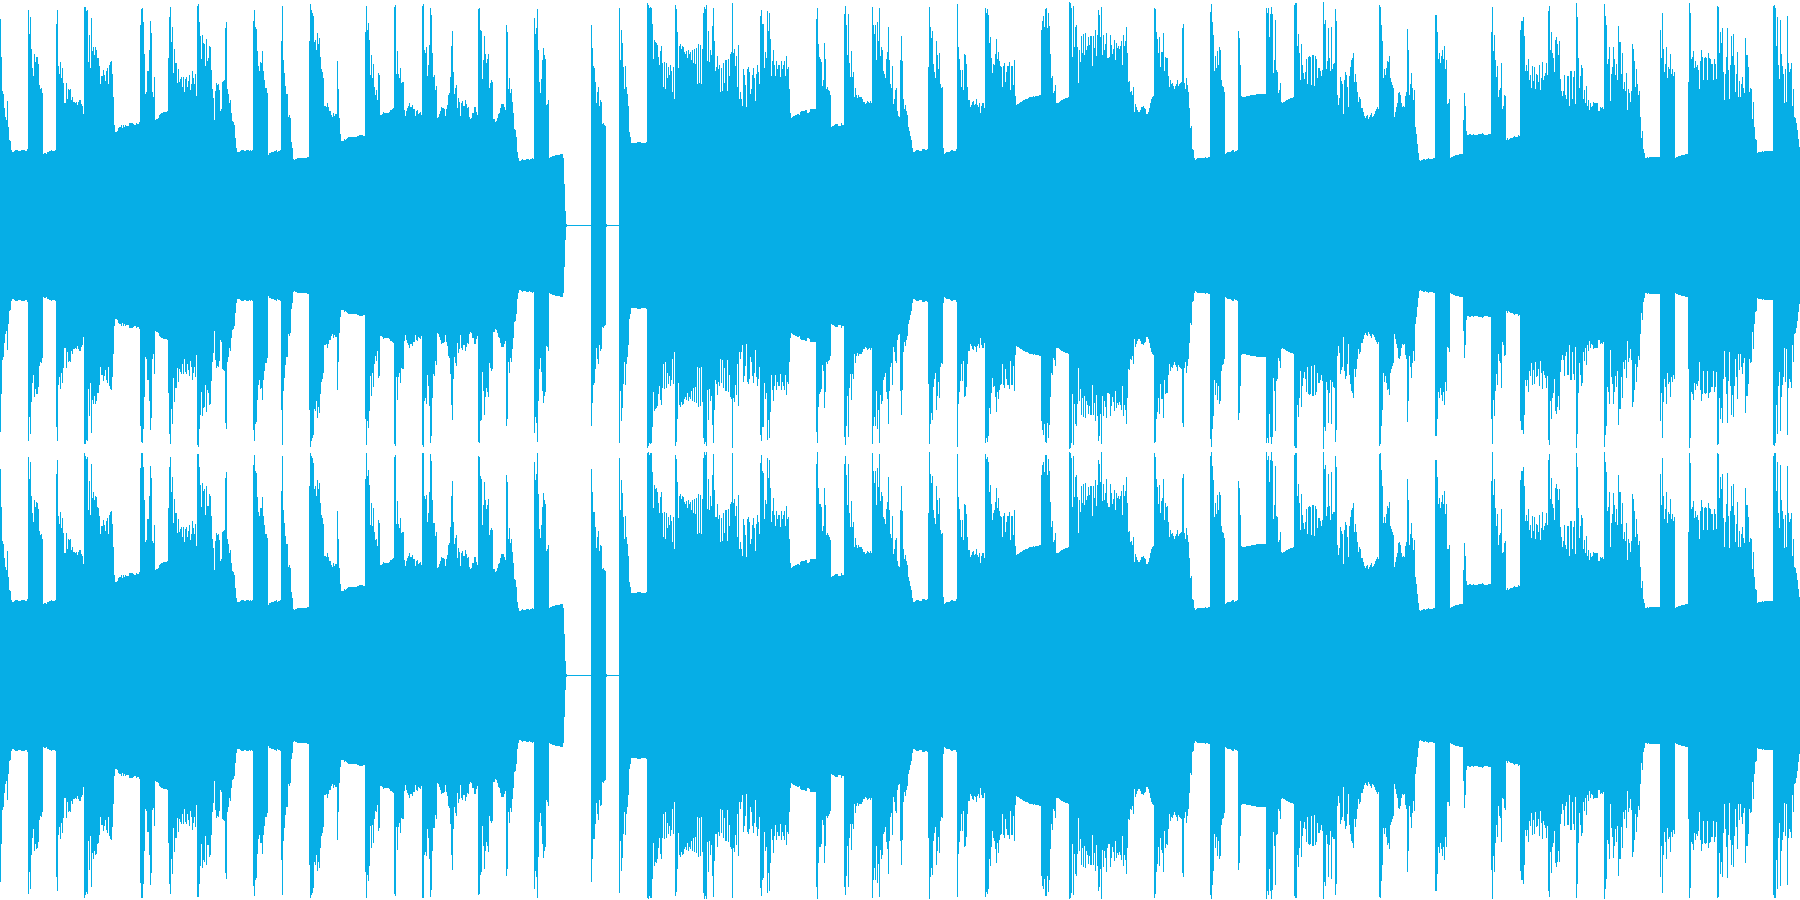 8Bitレトロゲーのんびりスカ風インストの再生済みの波形